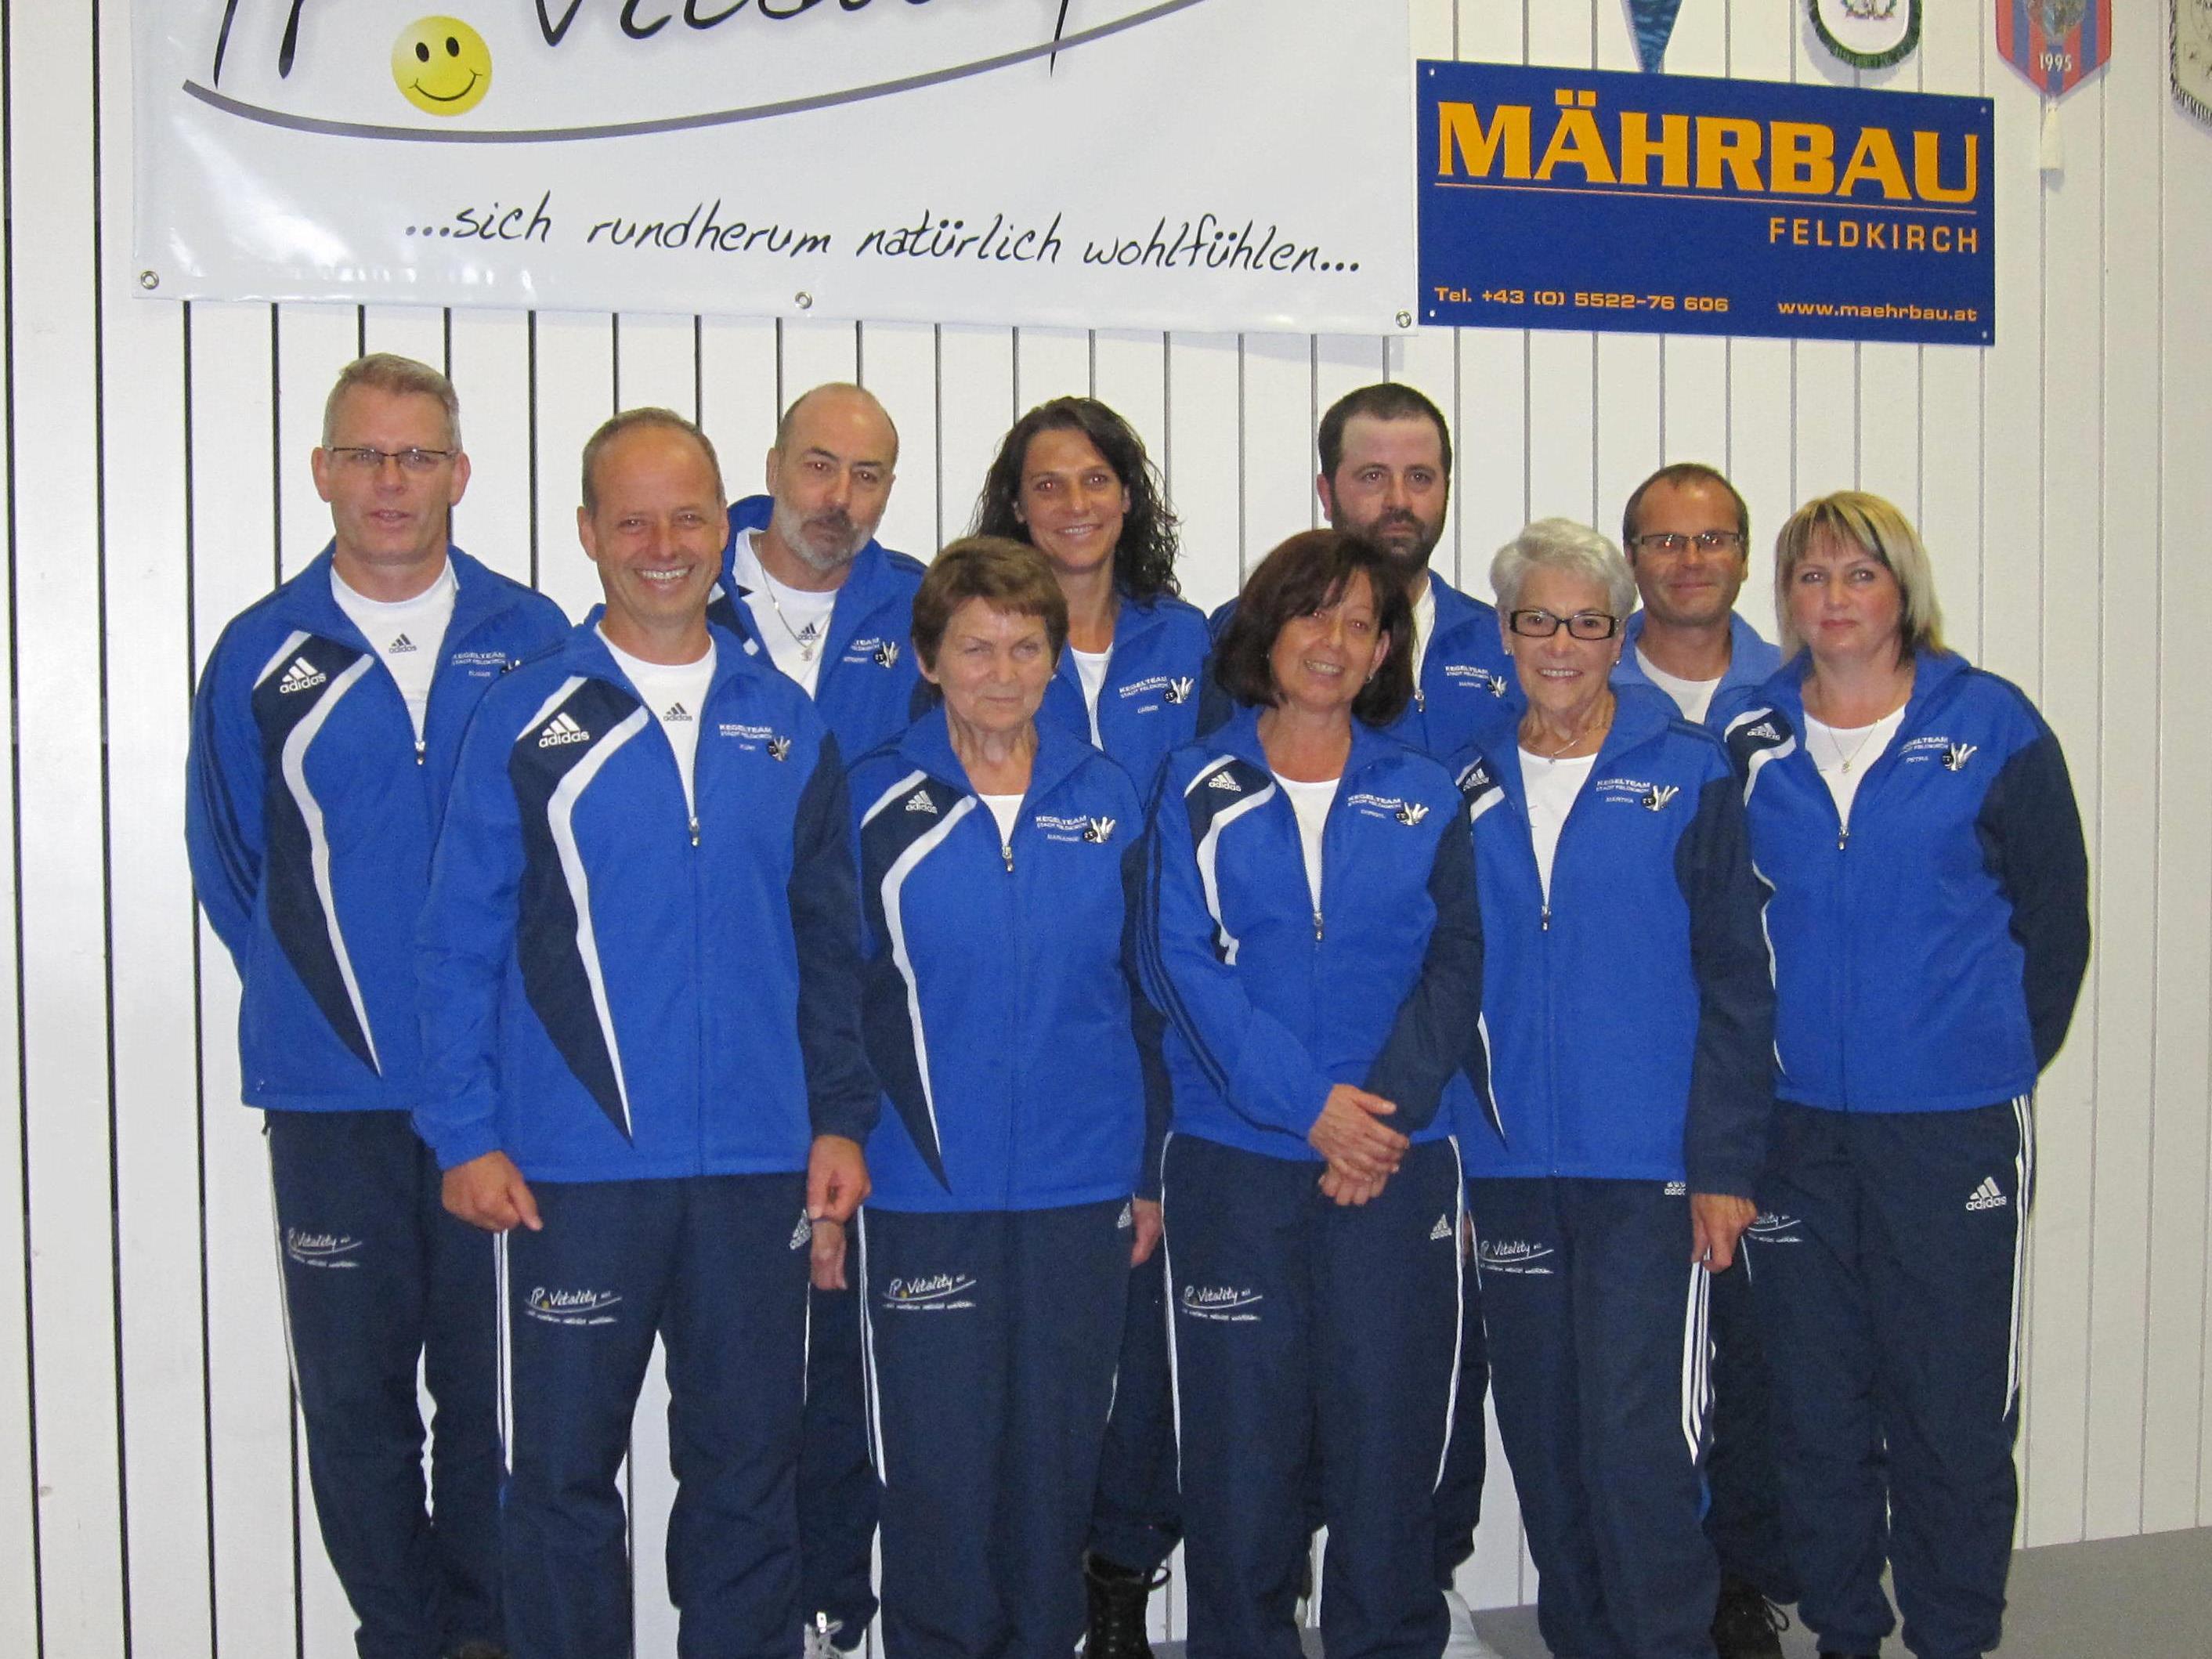 Holt sich Mannschafts-Meistertitel: KT Stadt Feldkirch 3 !